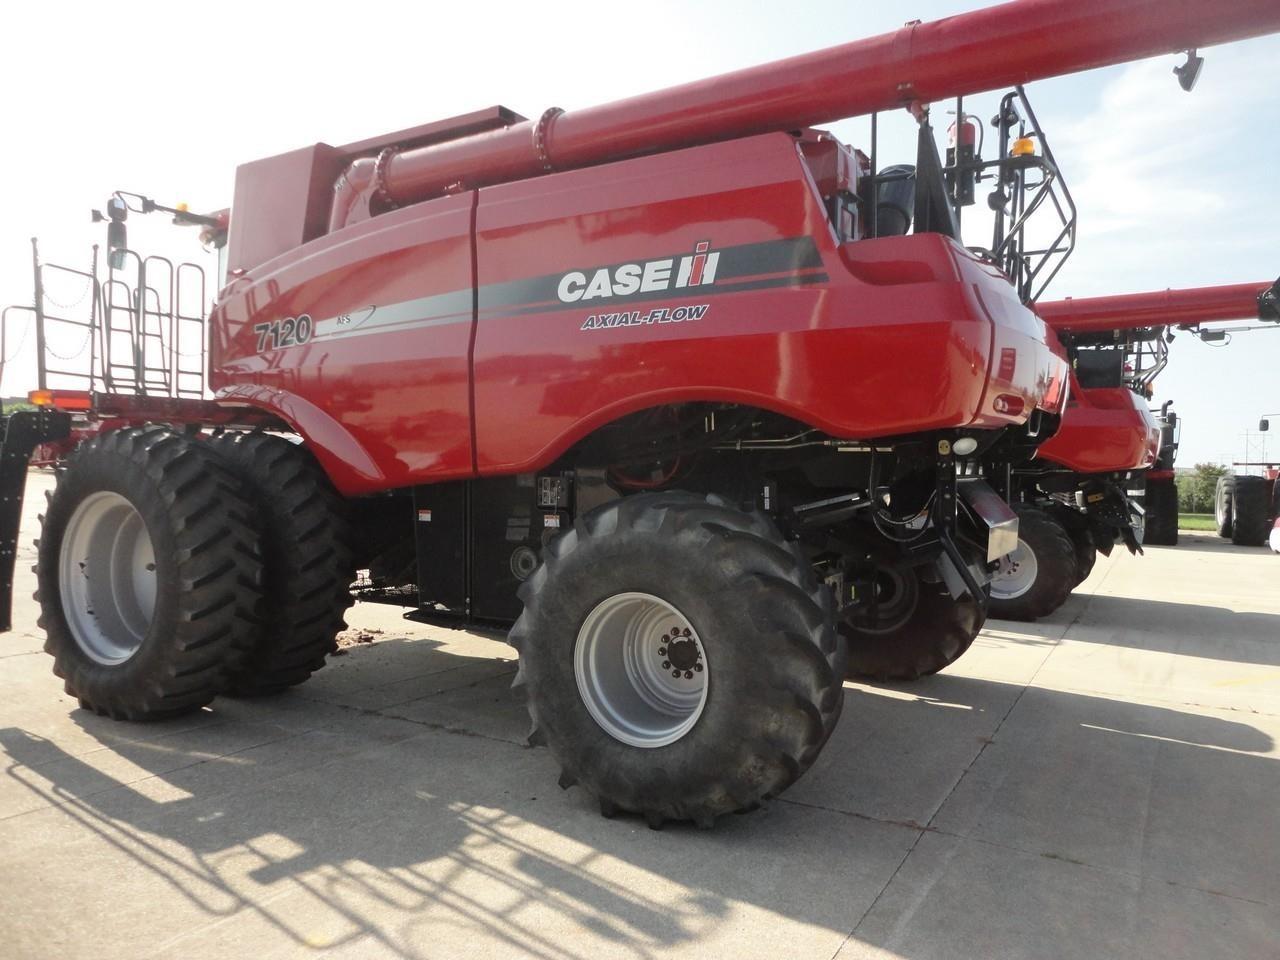 2012 Case IH 7120 Combine